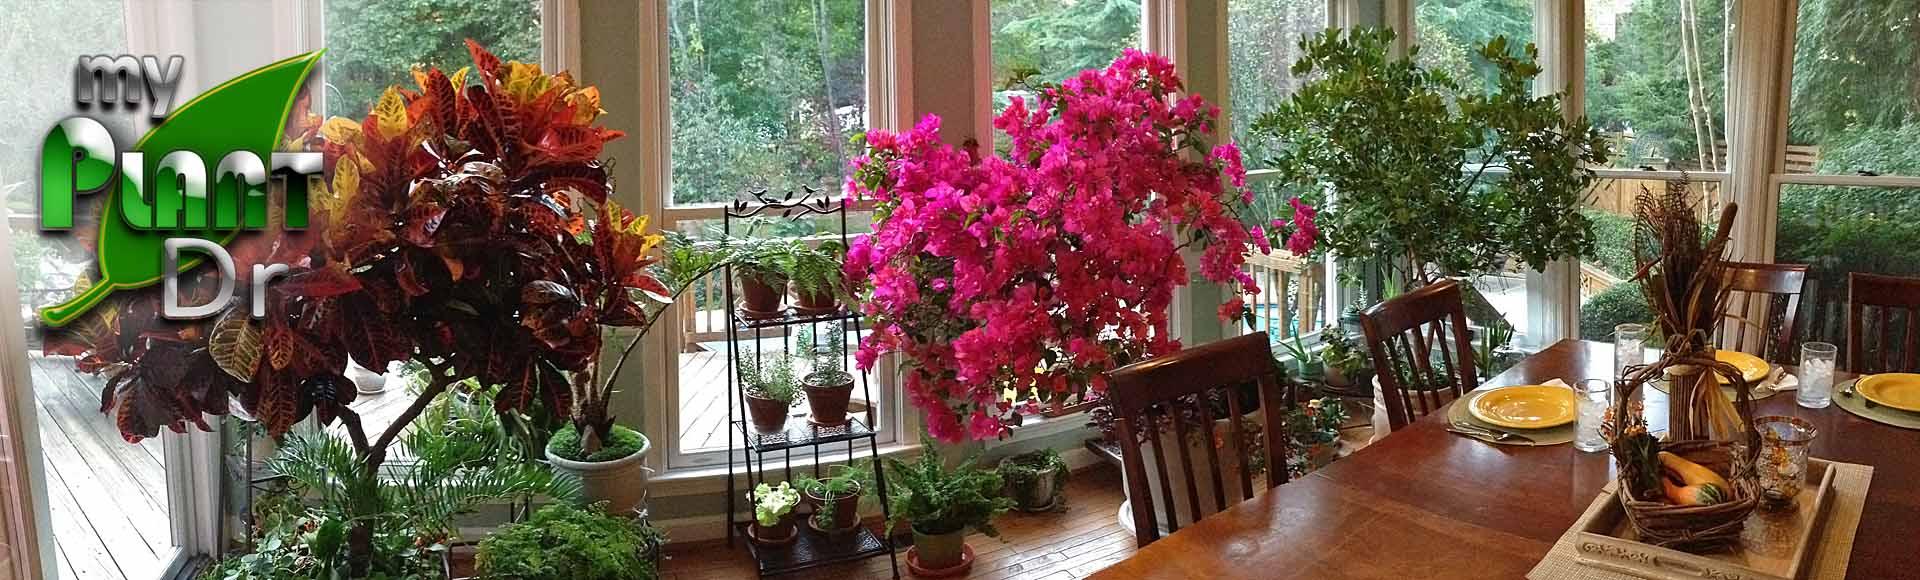 Favorite Plants